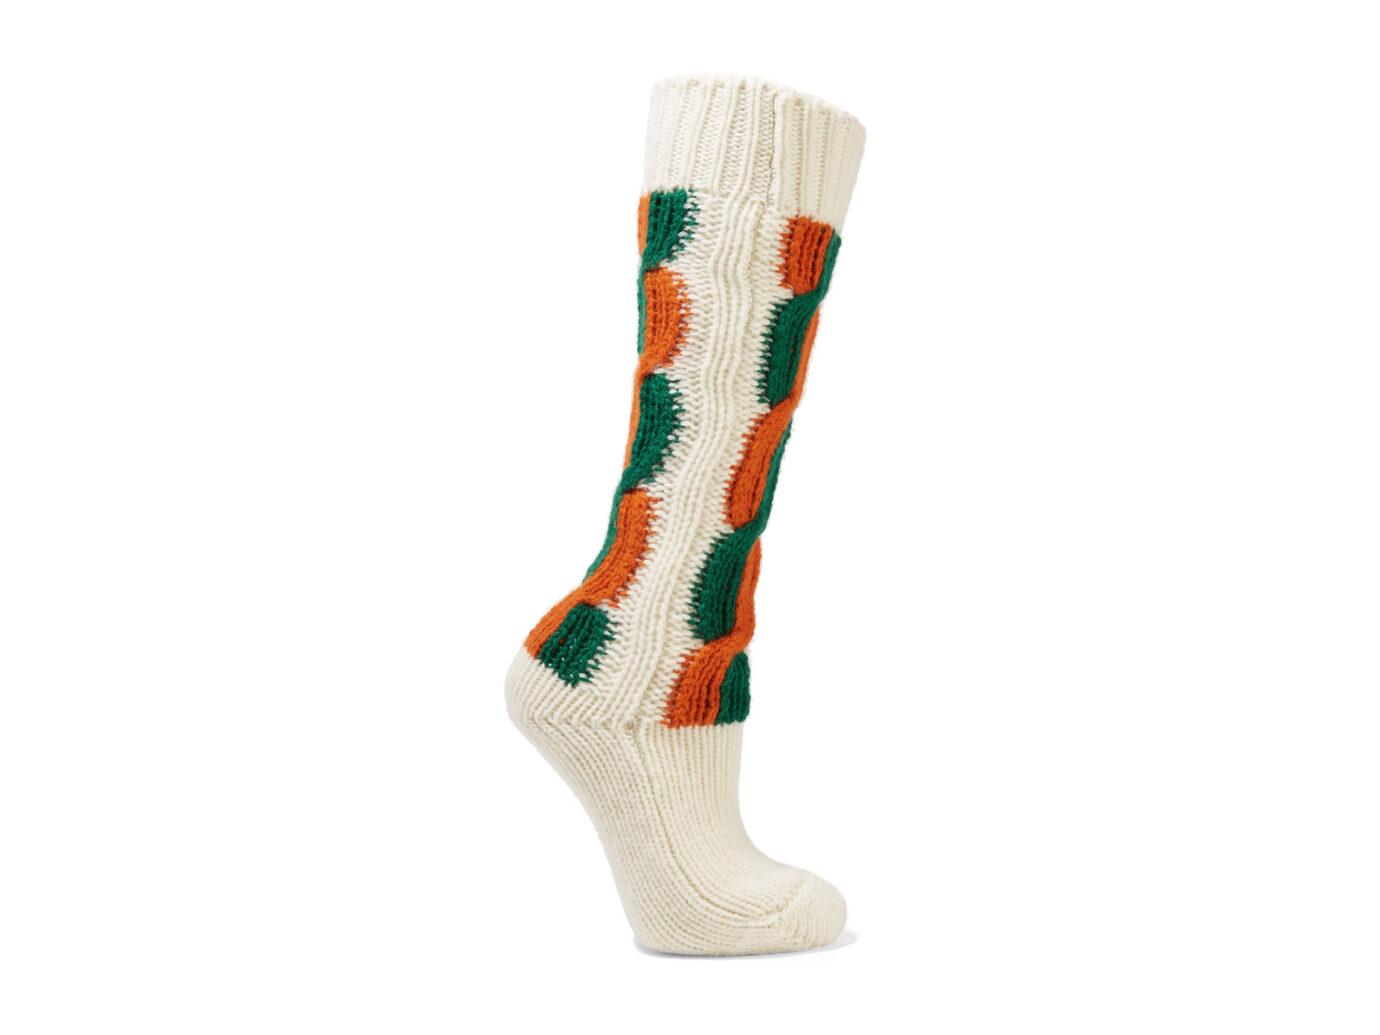 Gucci Striped Cable-Knit Socks